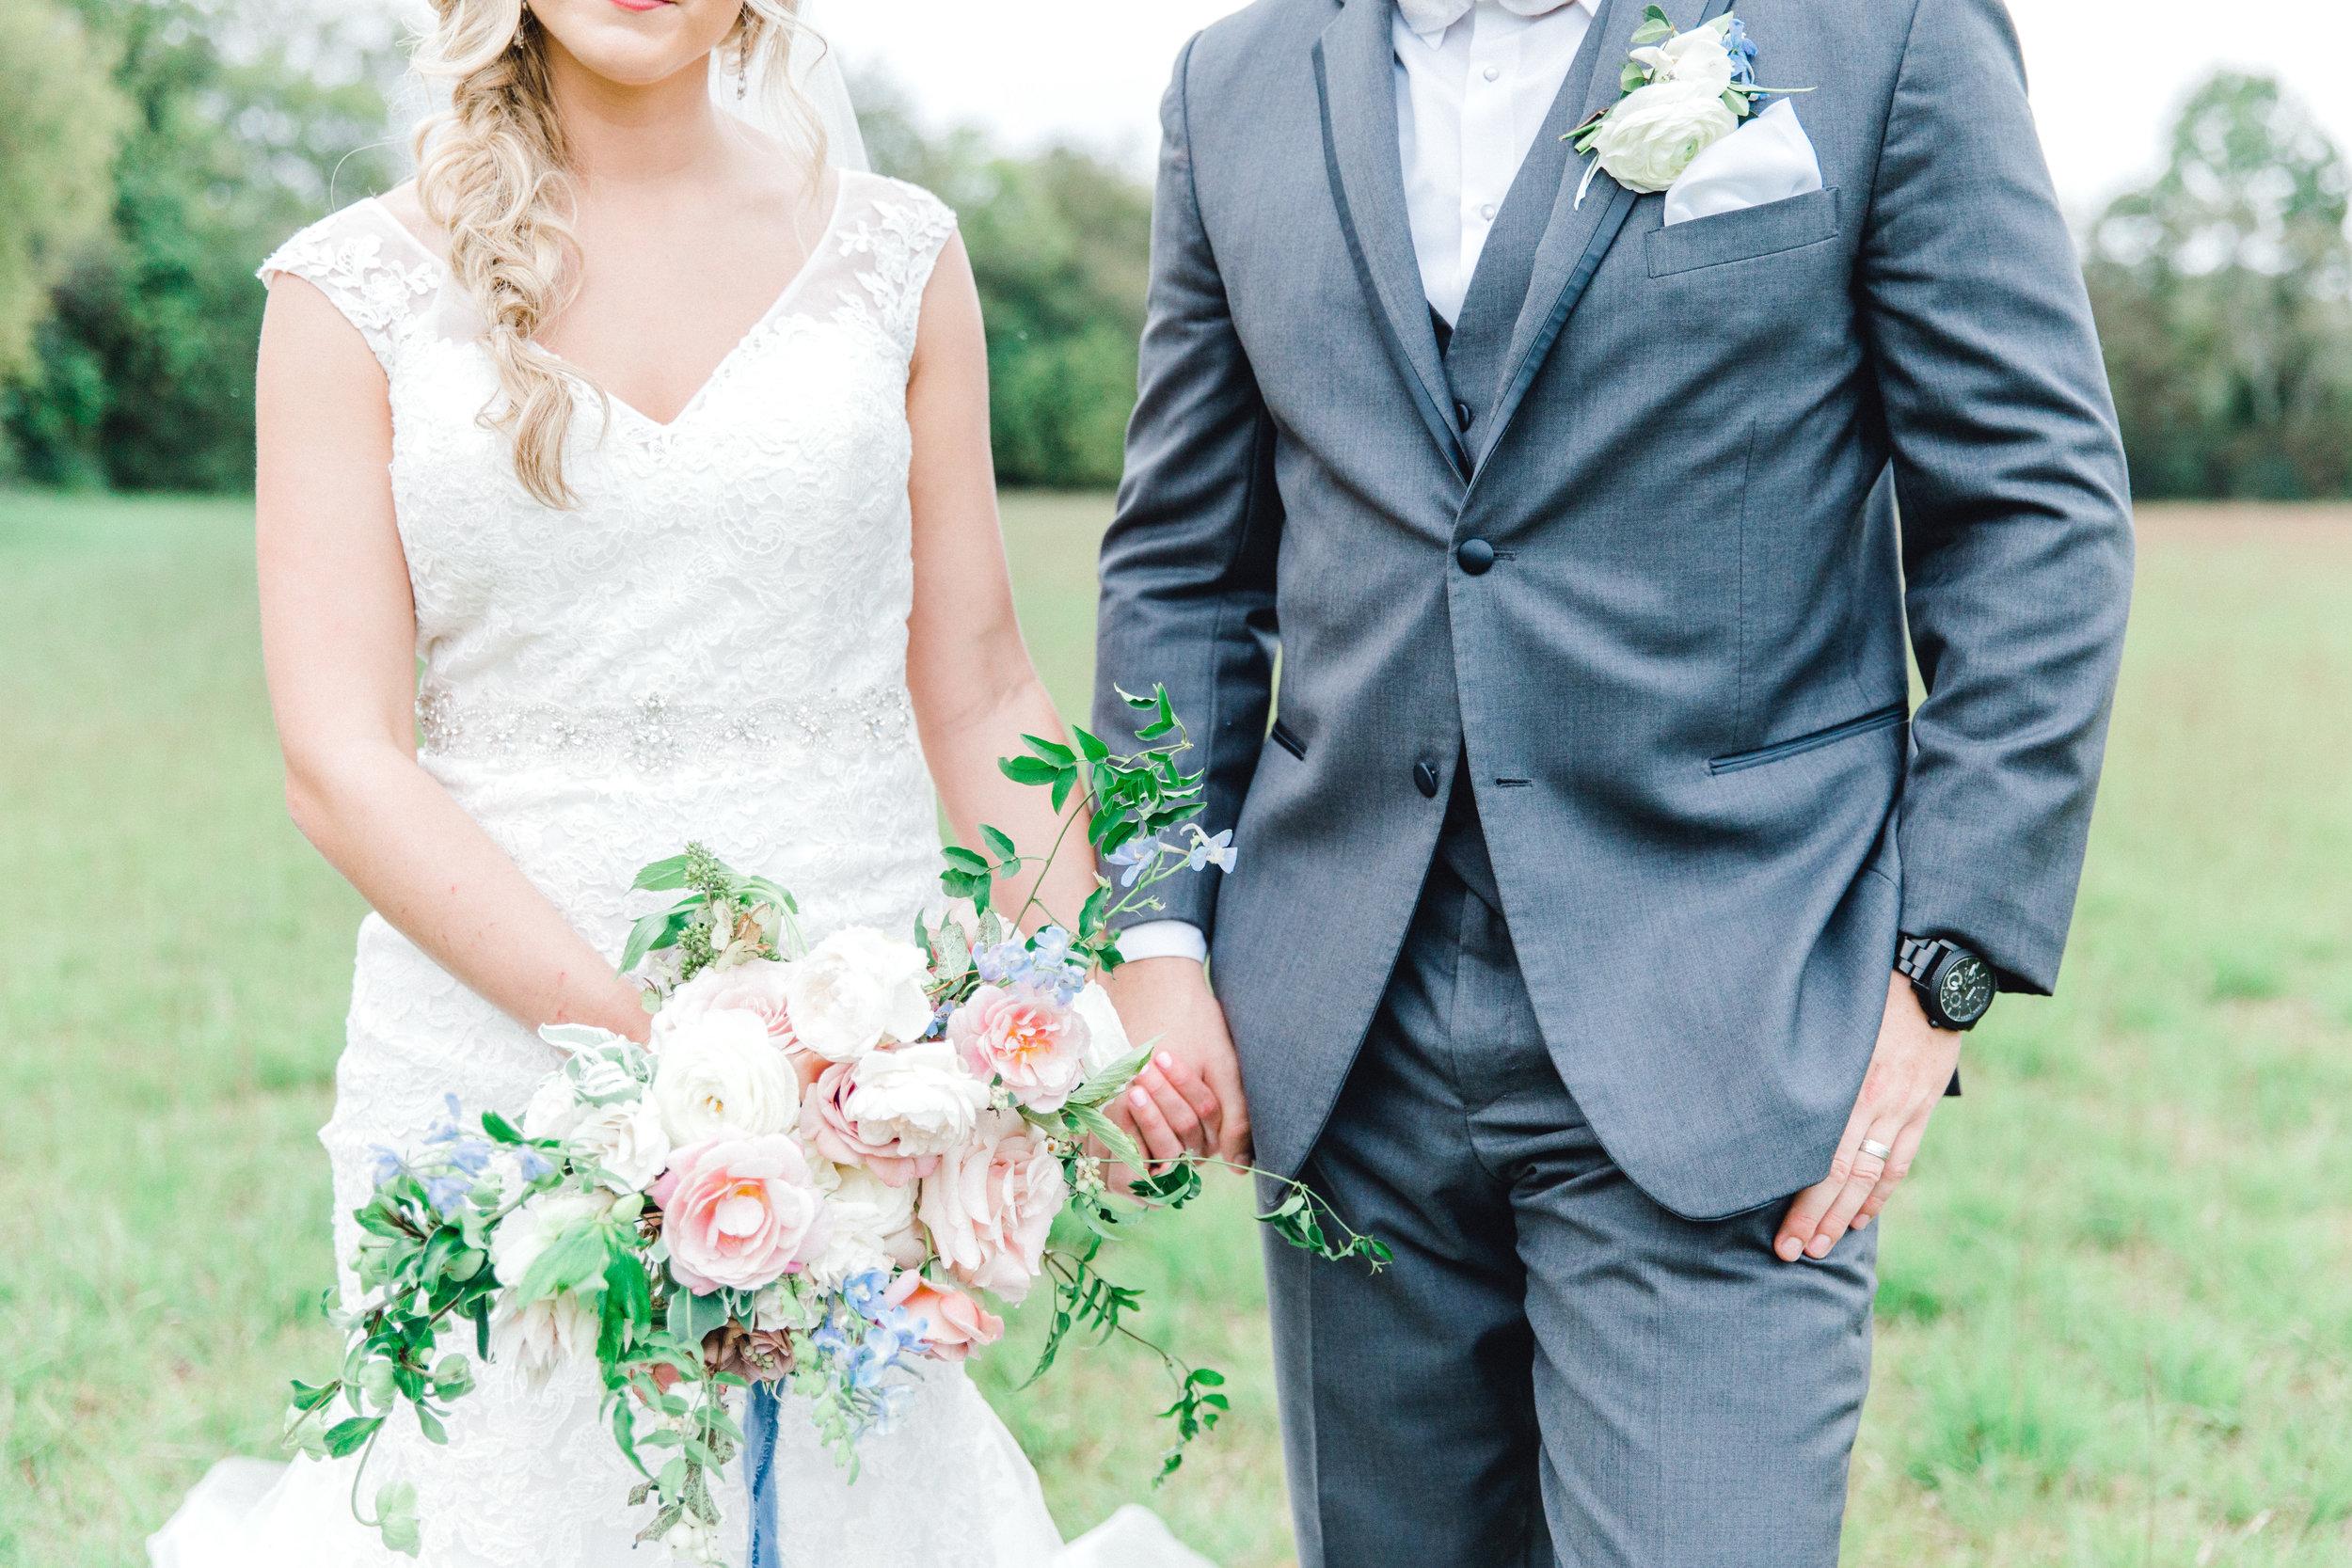 Paige-Mercer-Photography-Florida-Wedding-Photographer-Alyssa&Drew-73.jpg